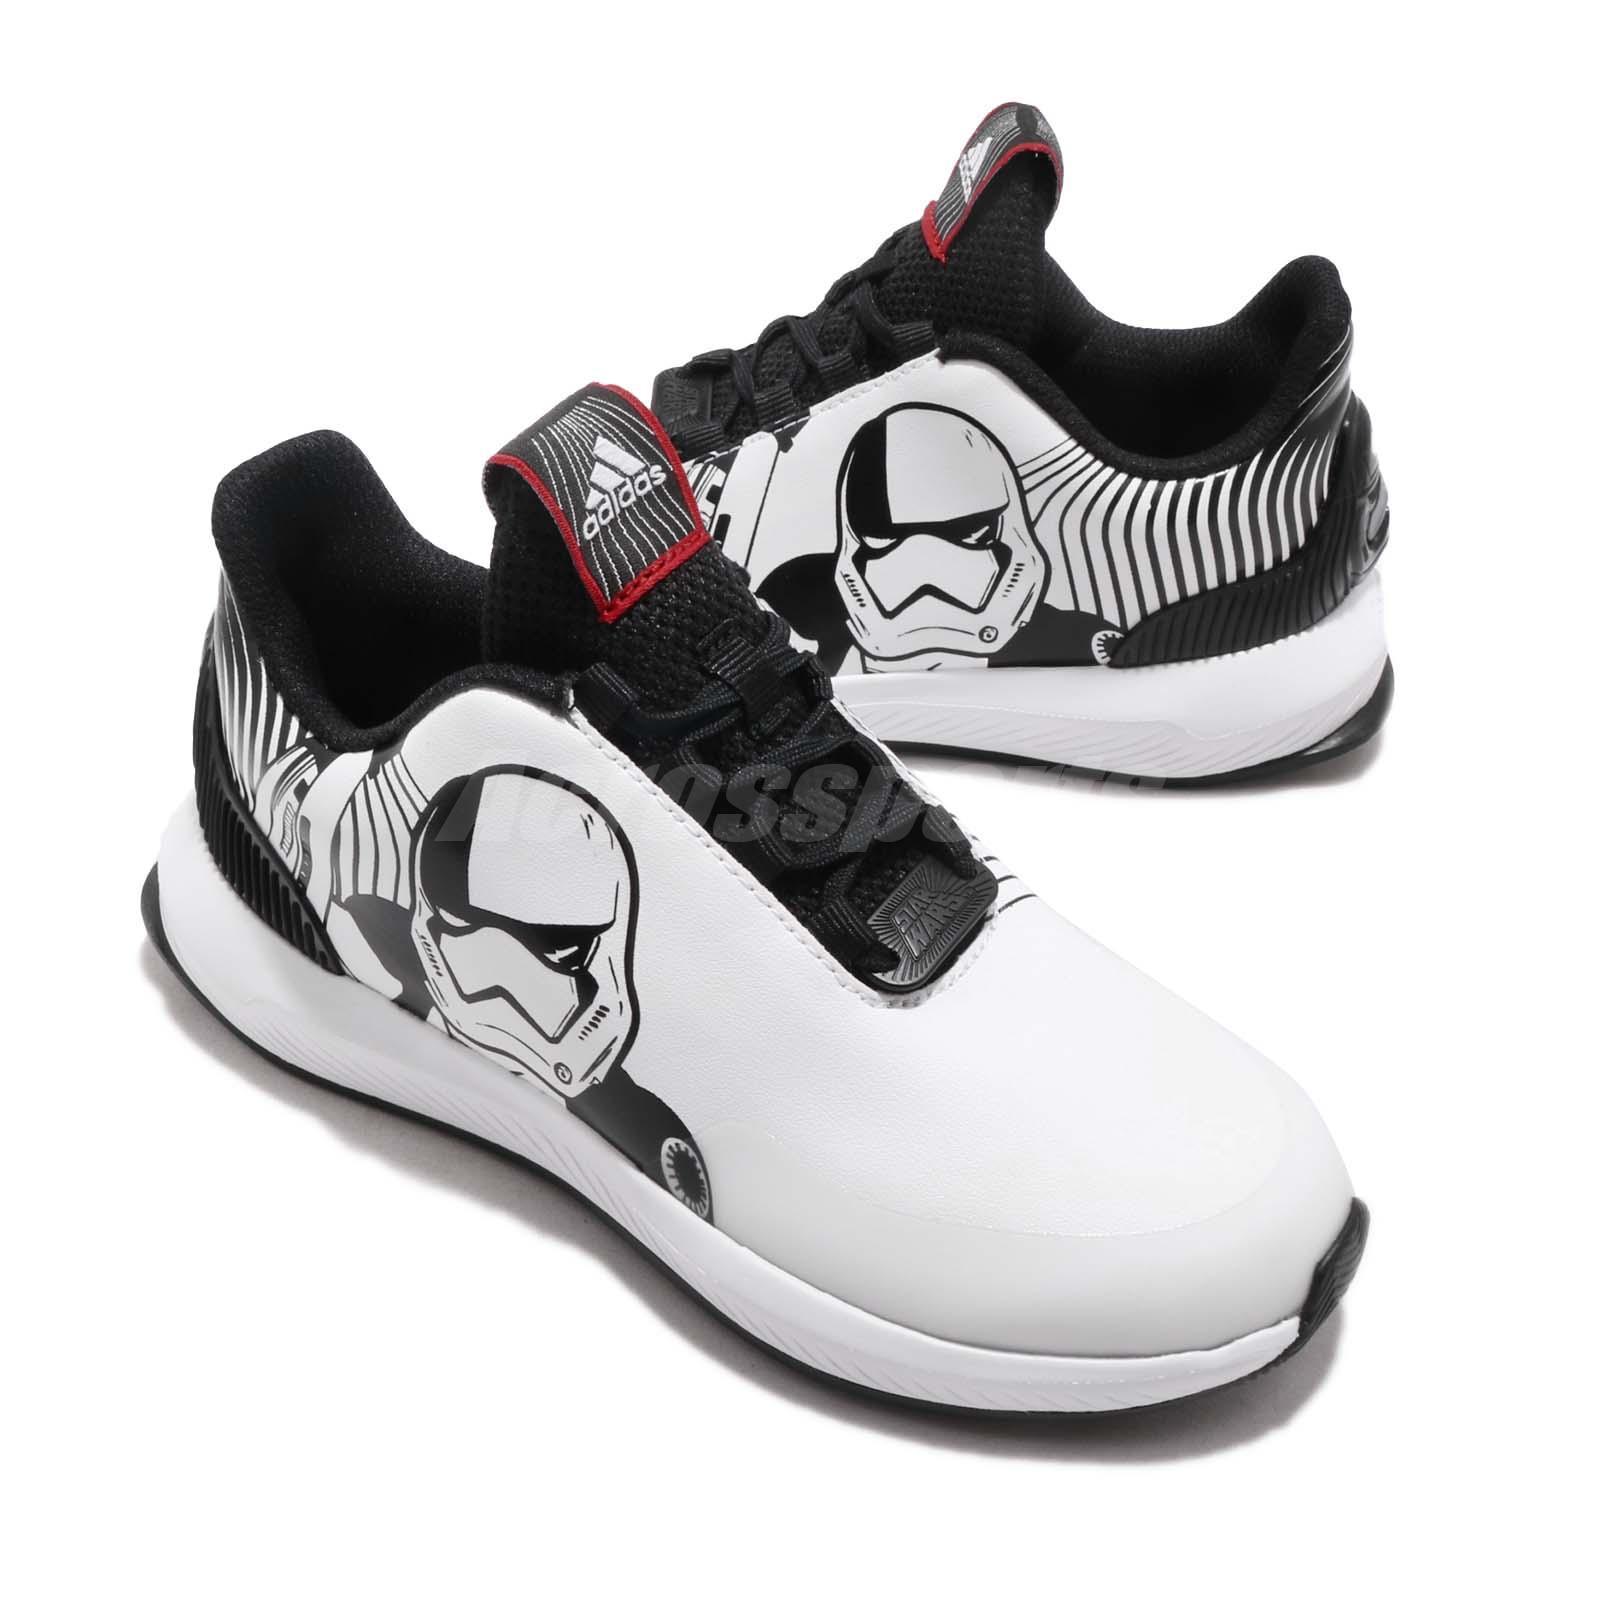 d6922c3d3 adidas RapidaRun Star Wars K Black White Scarlet Kid Preschool Shoes ...